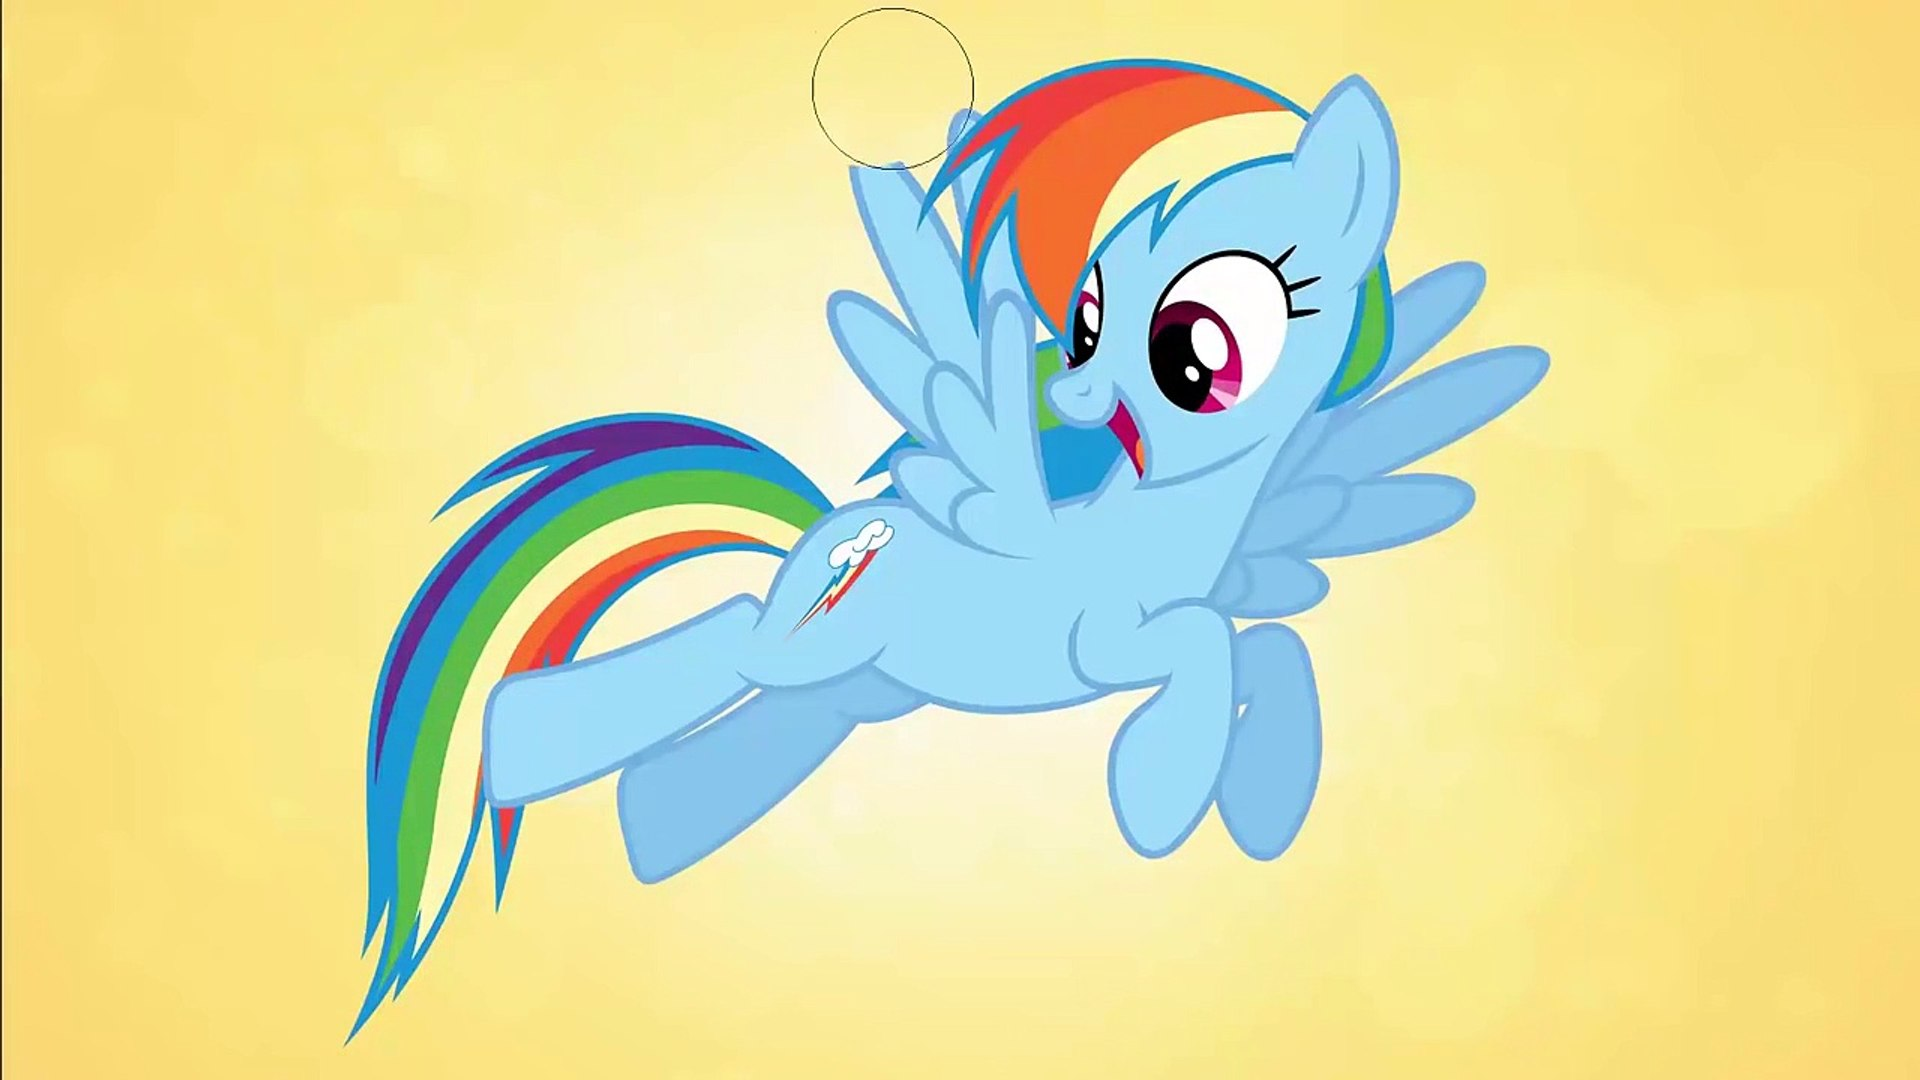 май литл пони сборник 4 серии русалки принцесса луна зебра зекора раскраска Tv